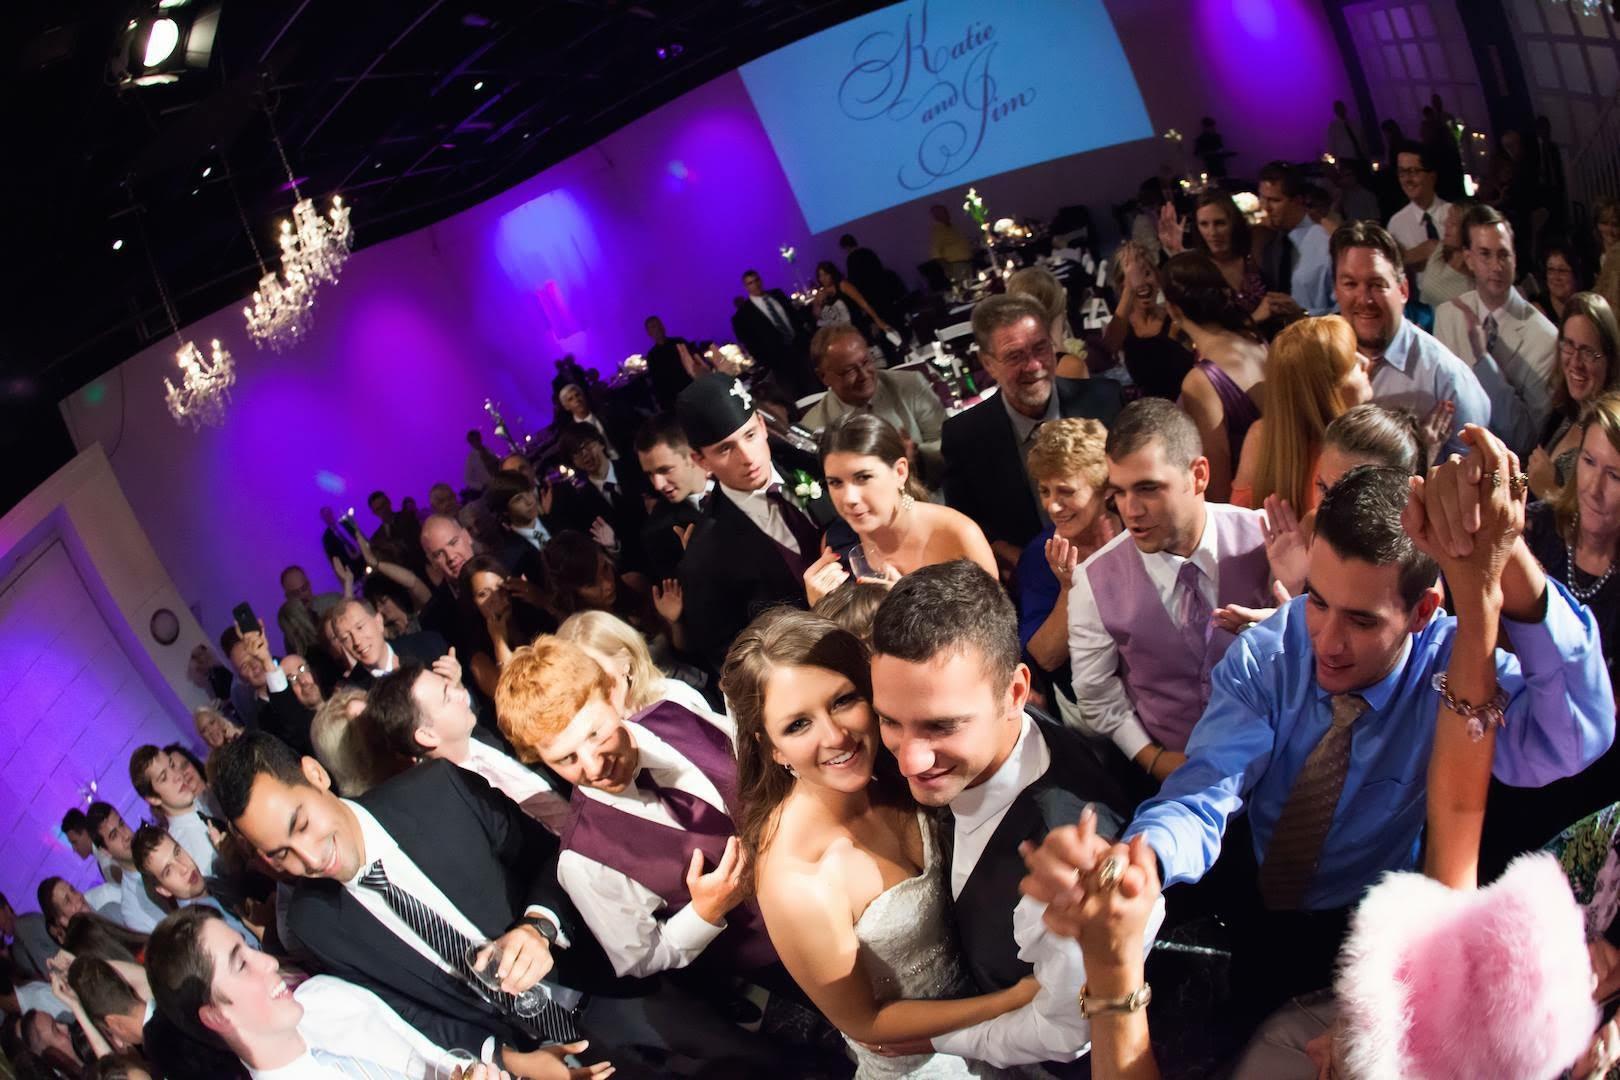 pa-wedding-entertainment-43.jpg